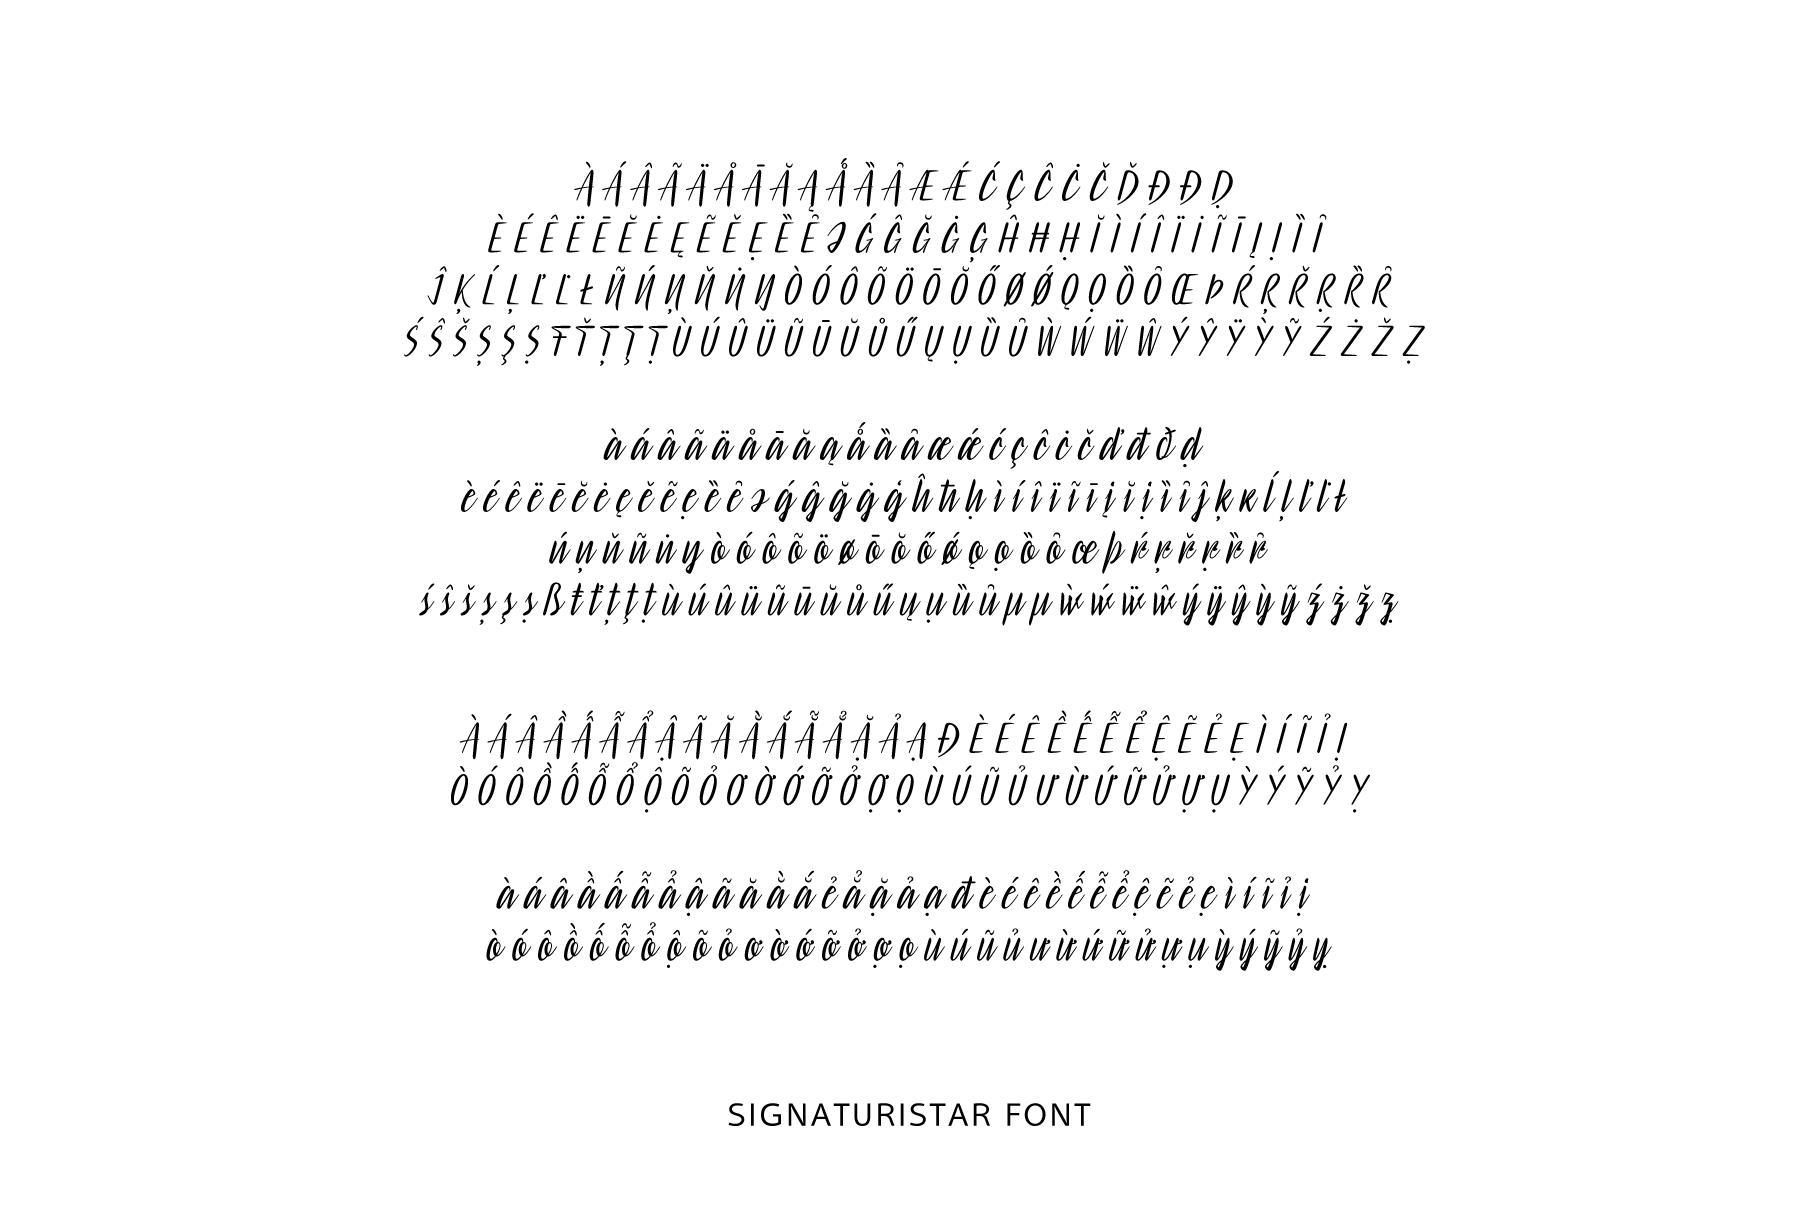 Signaturistar